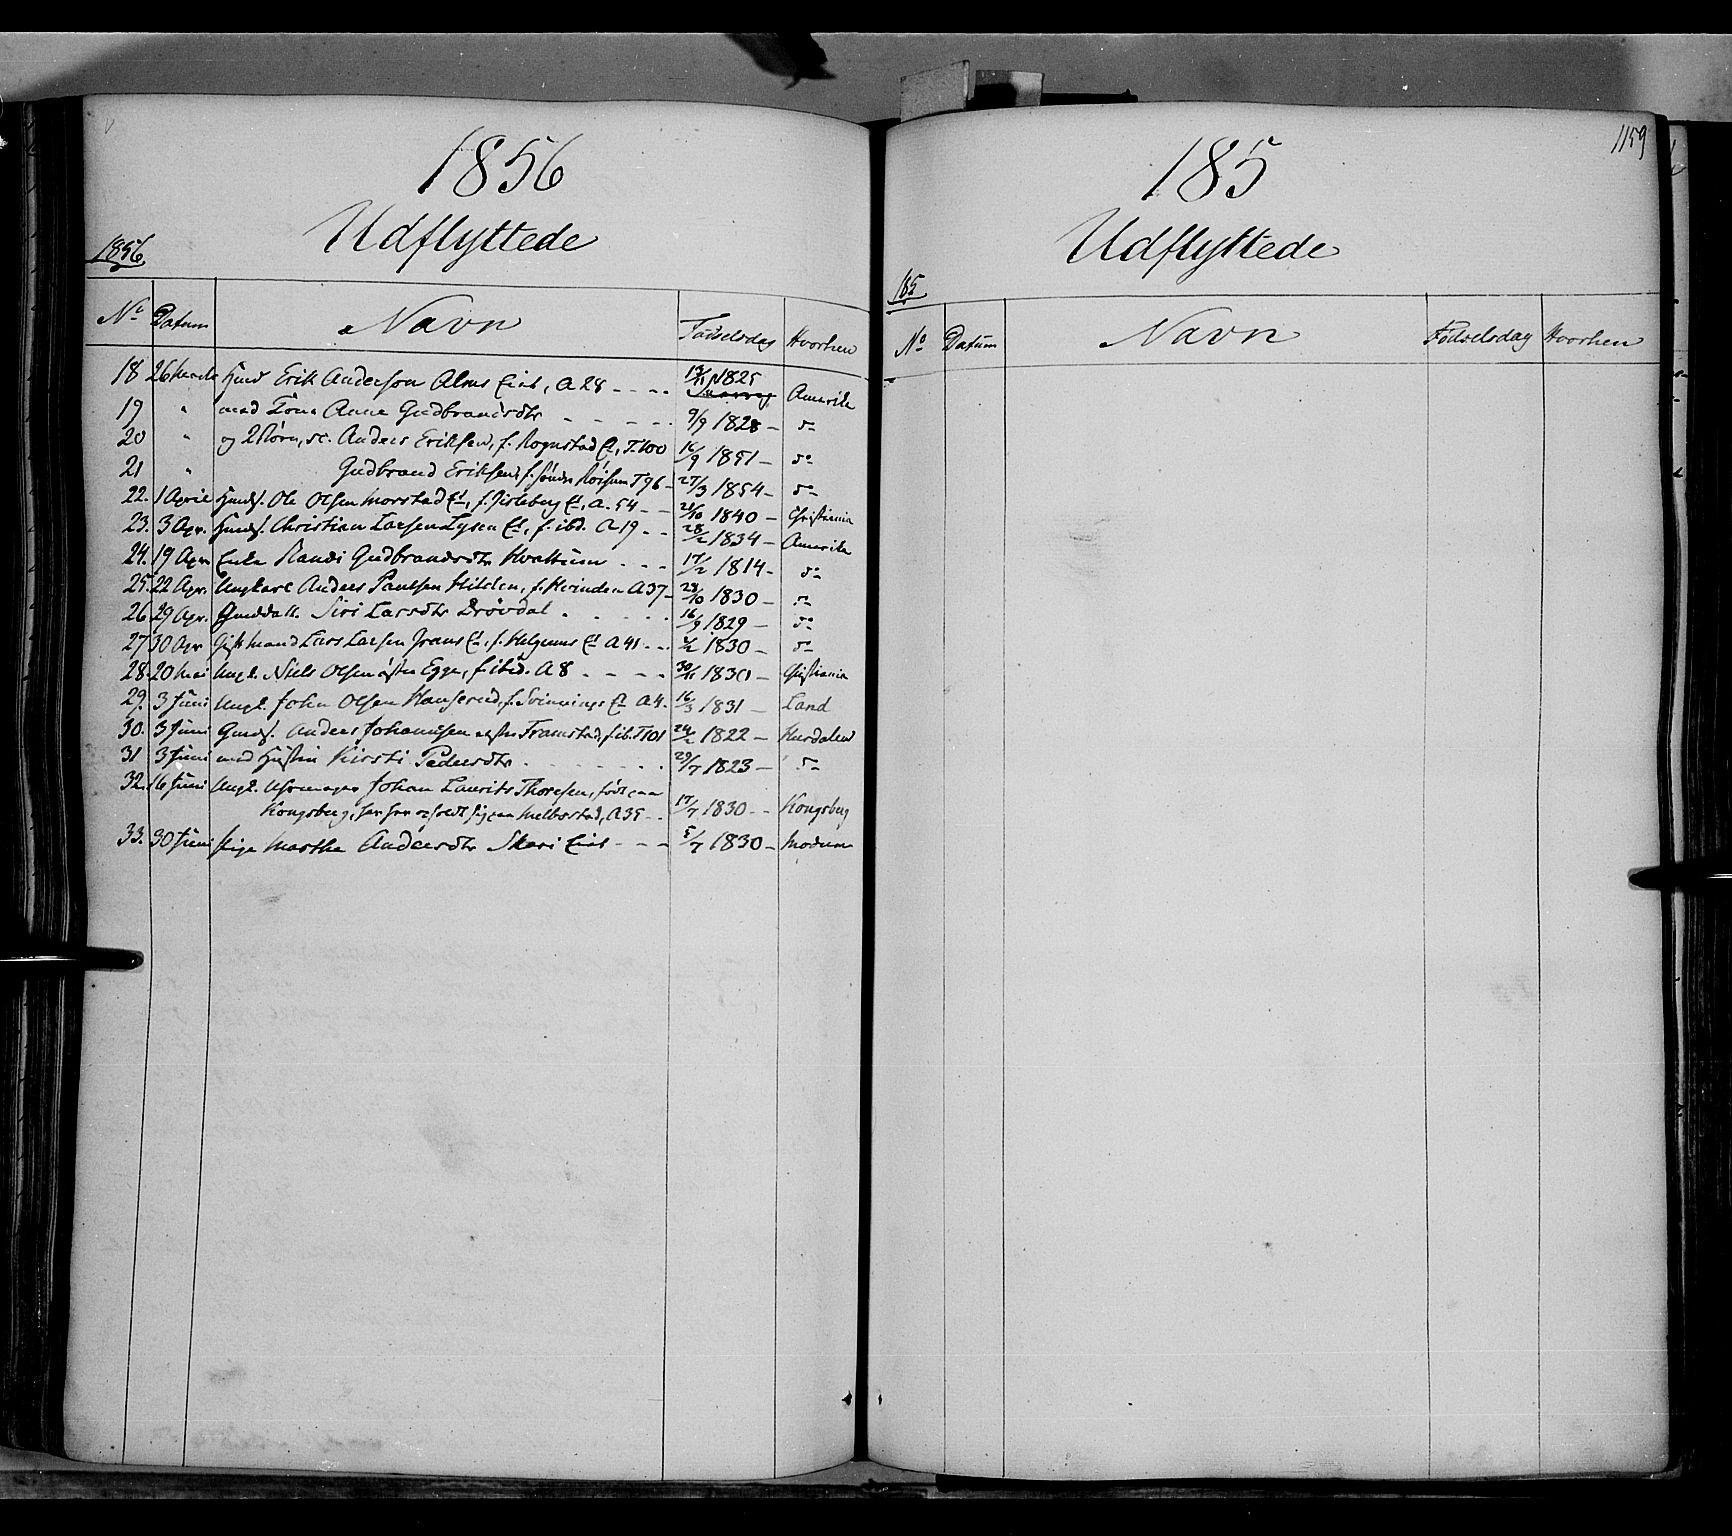 SAH, Gran prestekontor, Ministerialbok nr. 11, 1842-1856, s. 1158-1159